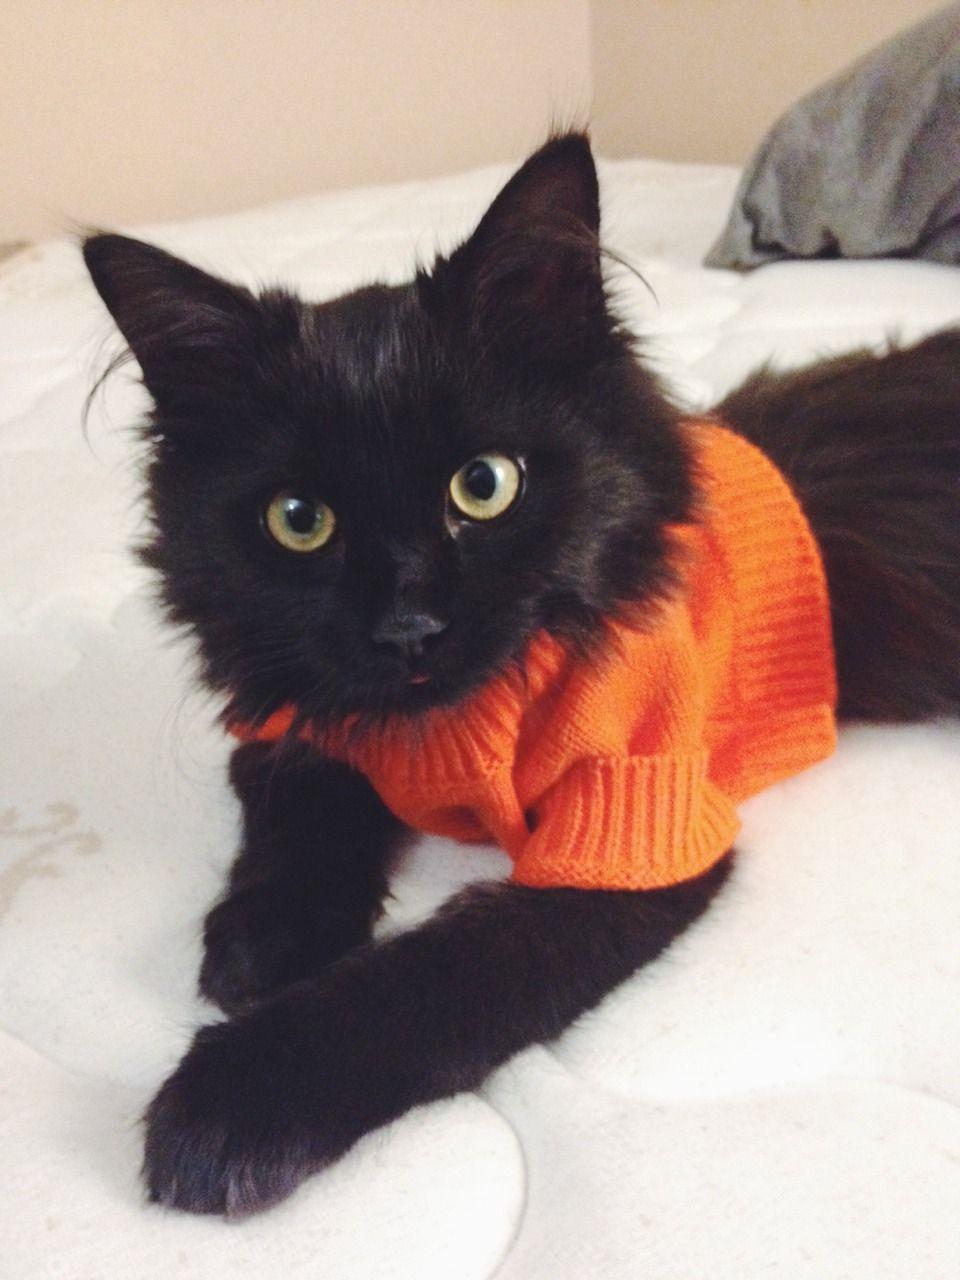 ..., I put a sweater on my kitty today. She looks like...